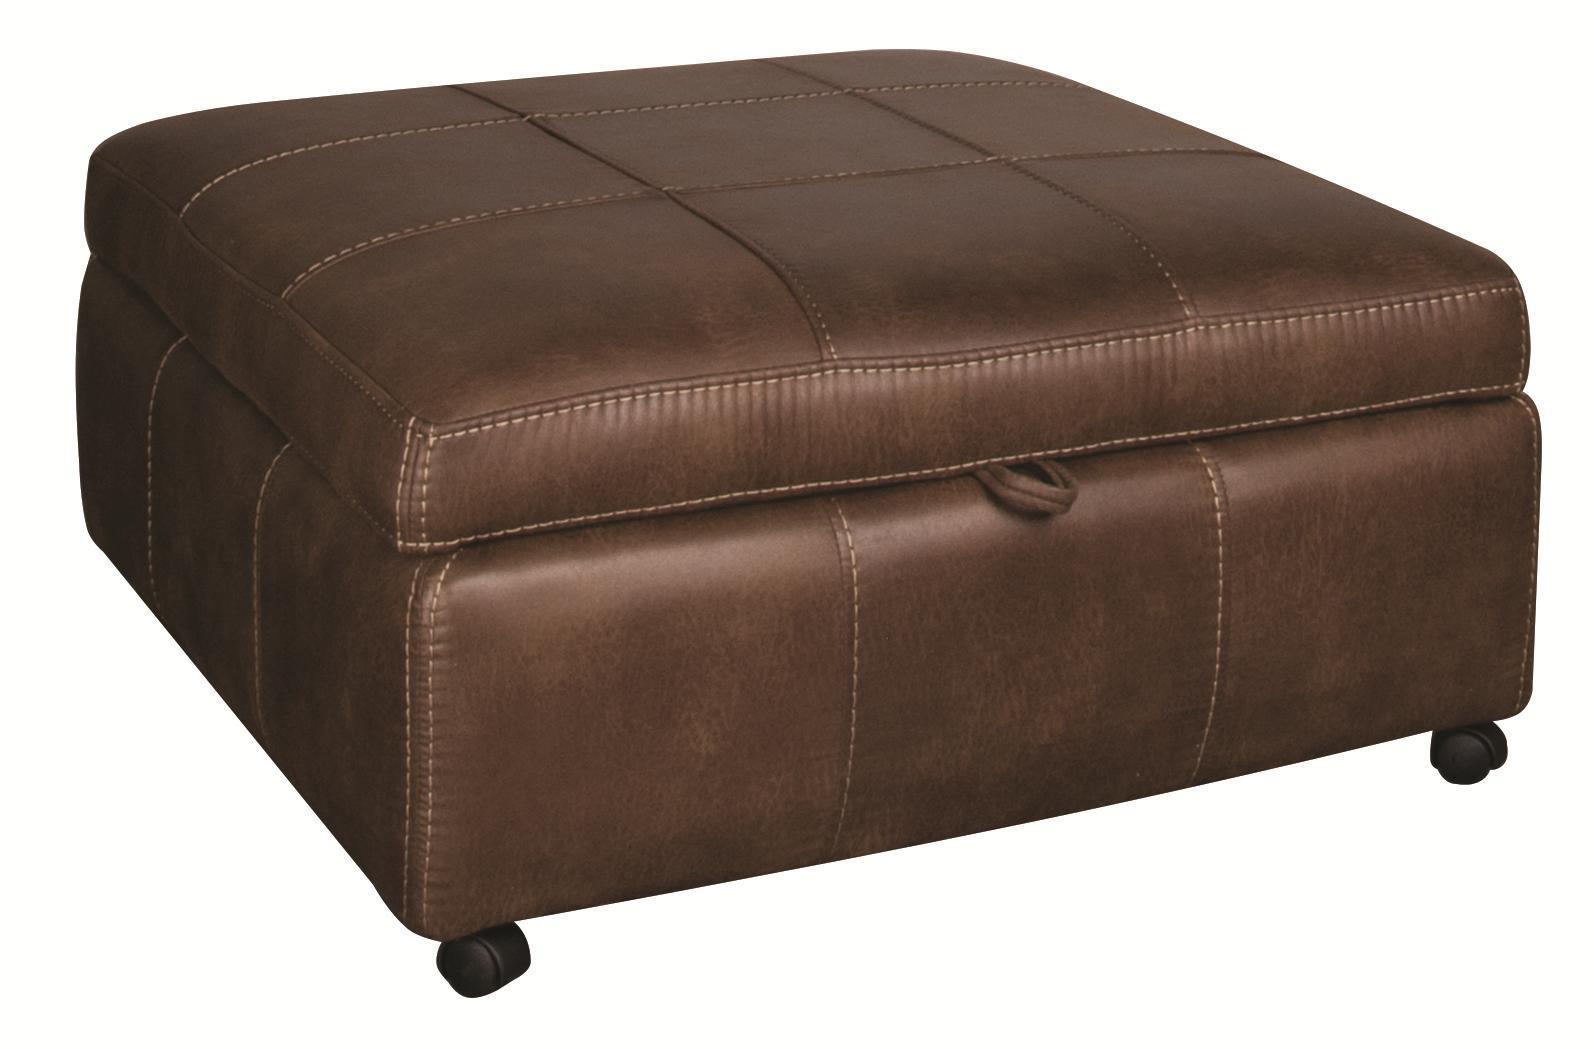 Morris Home Furnishings Sandra Sandra Storage Ottoman - Item Number: 233812949